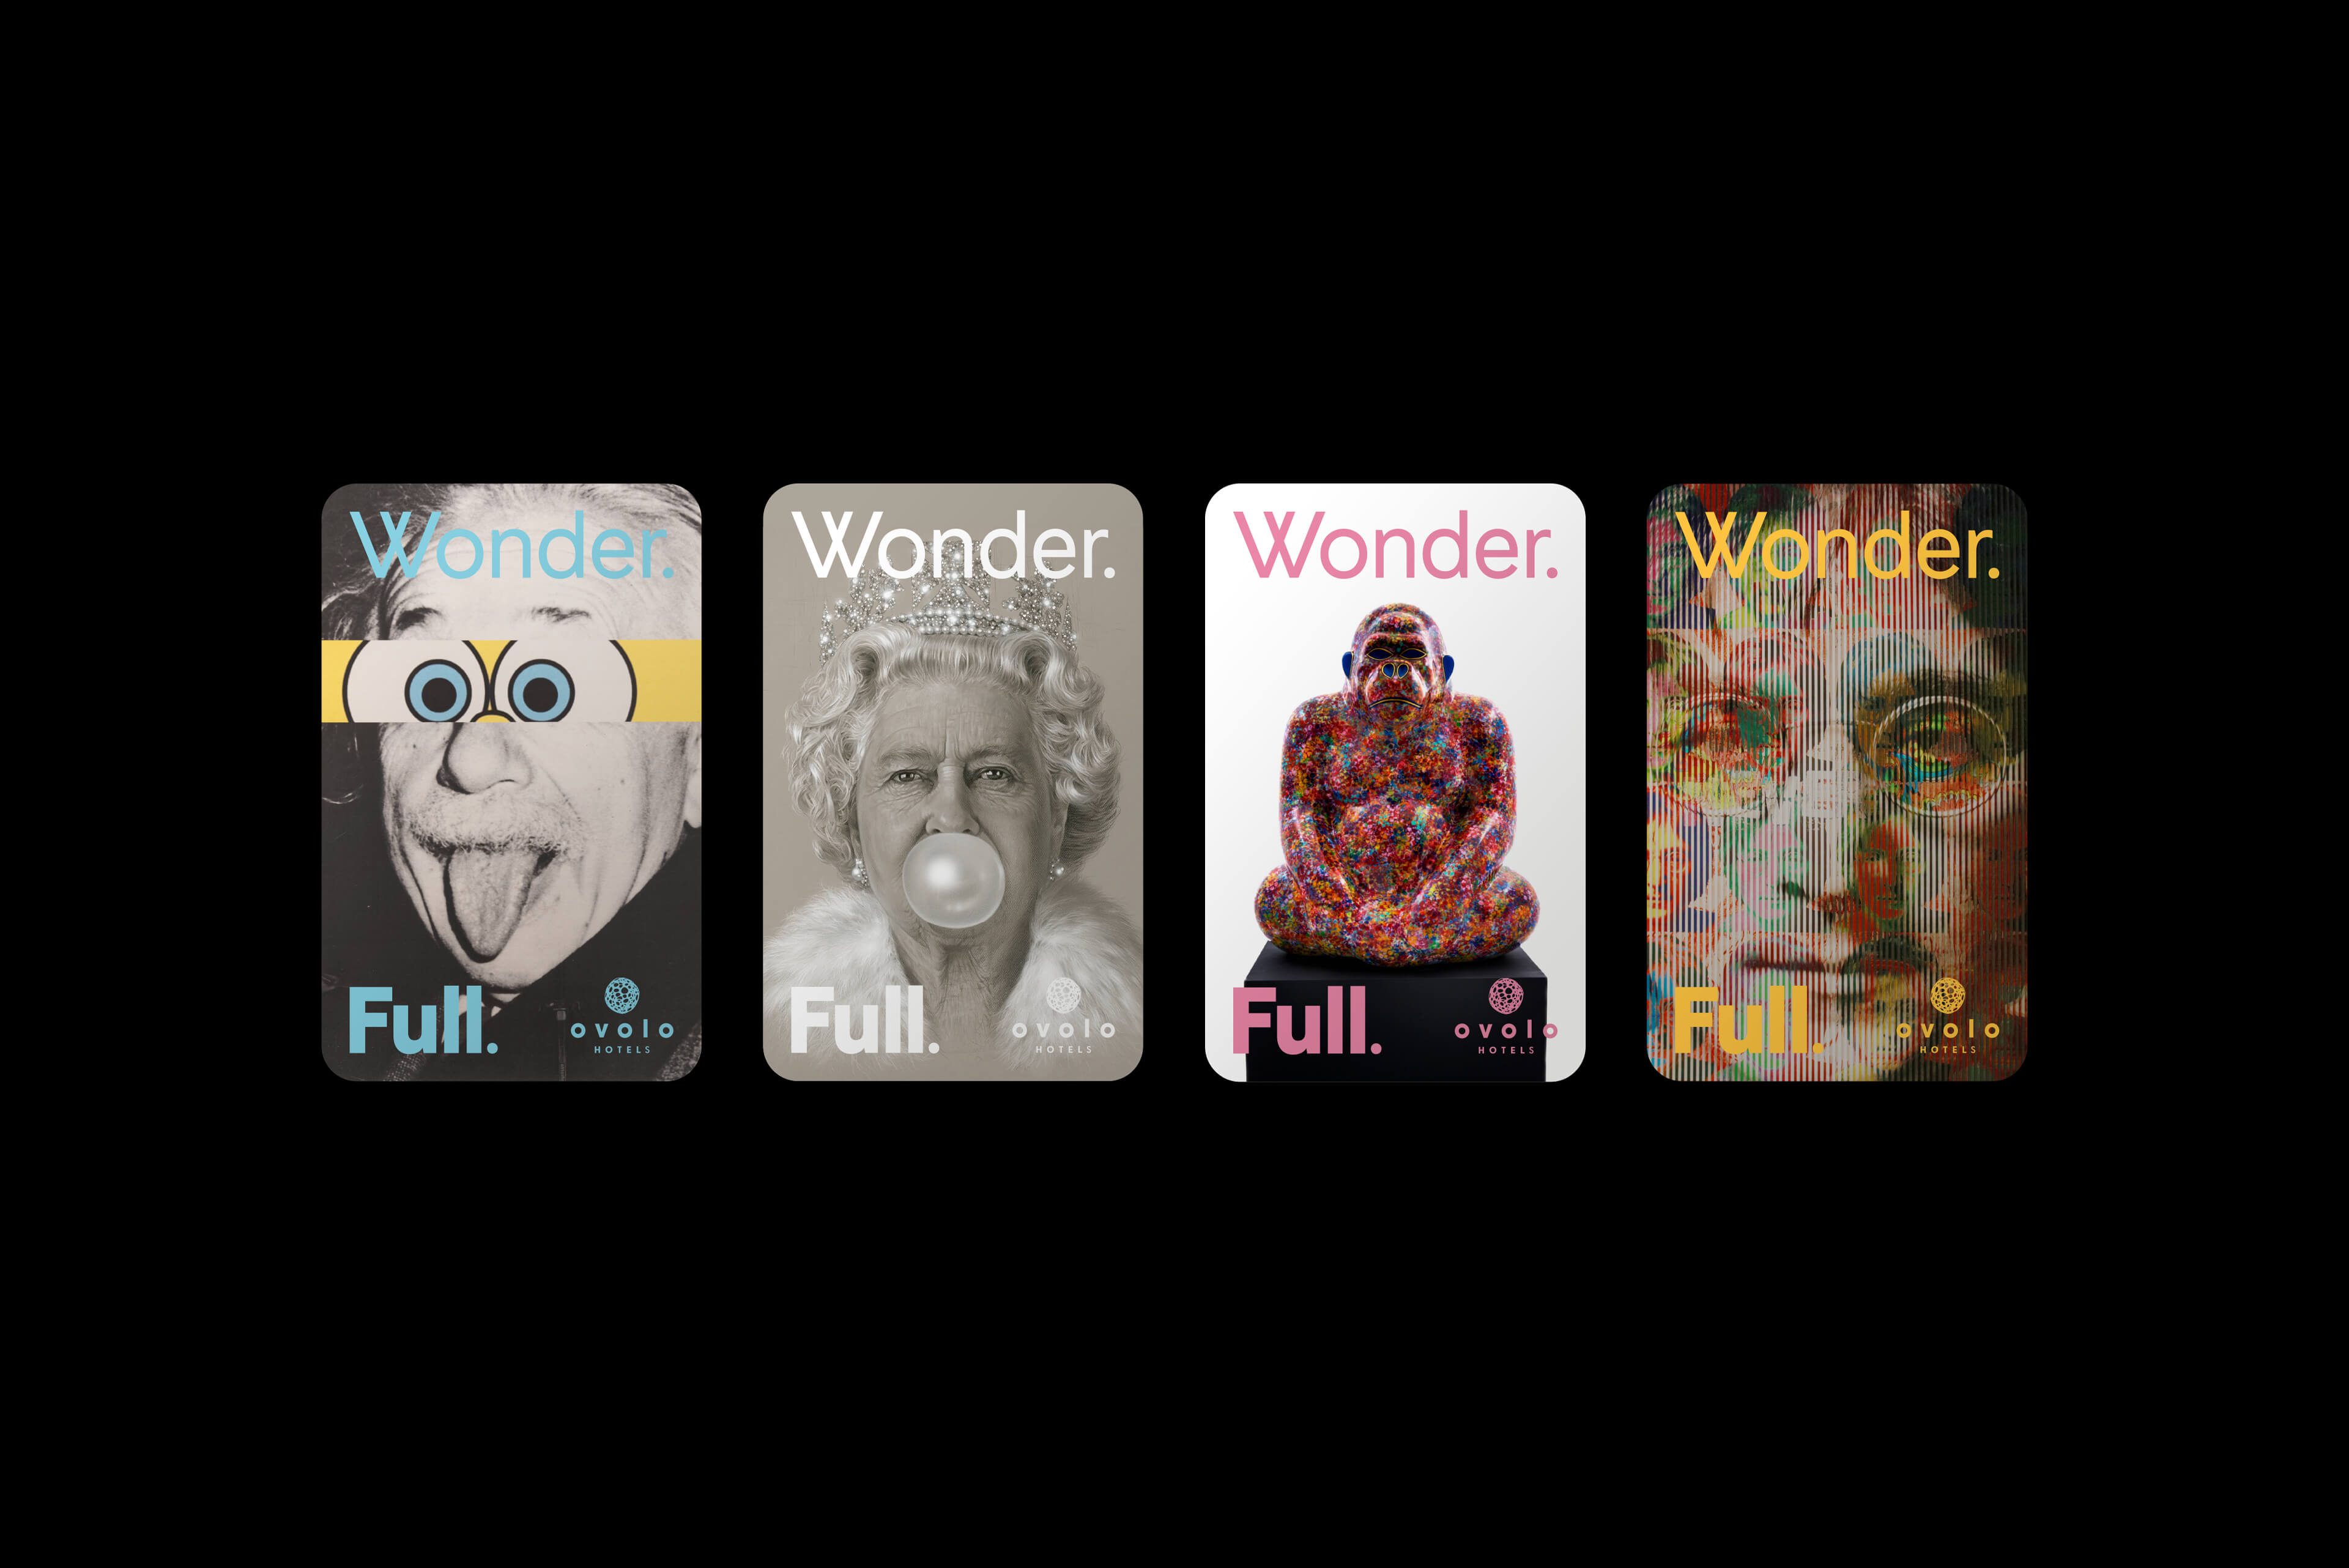 Ovolo Hotels Brand Refresh - Wonder. Full. Hotel Door Cards